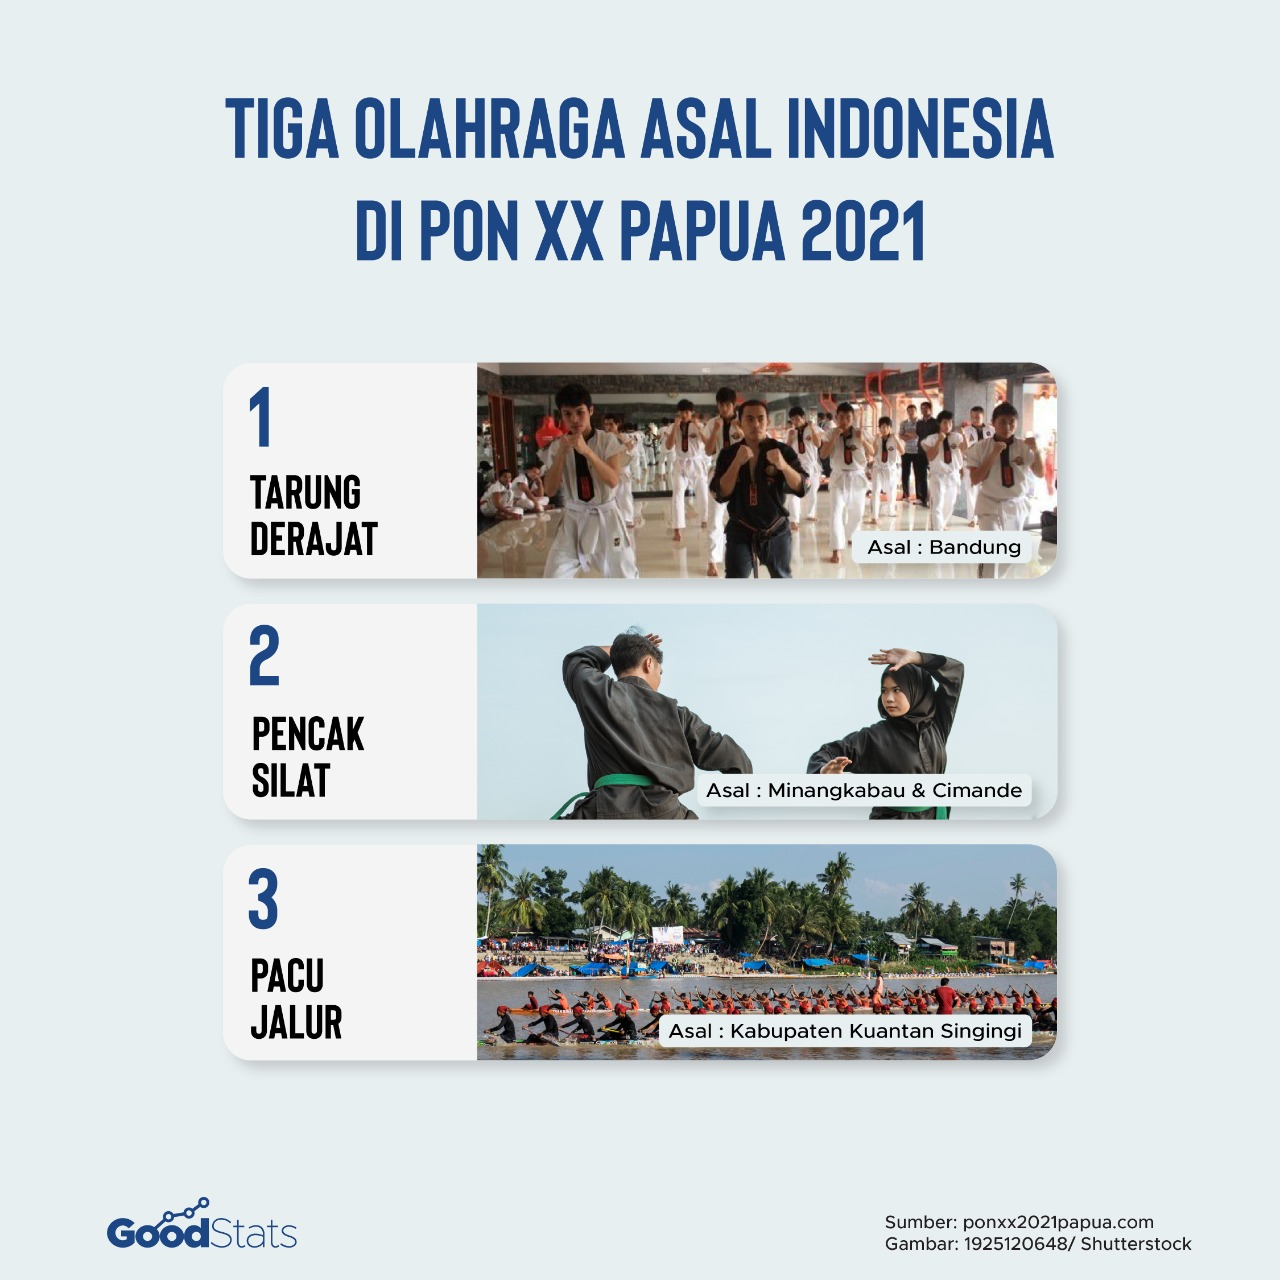 Daftar Olahraga Asli Indonesia di PON | Goodstats/Angel